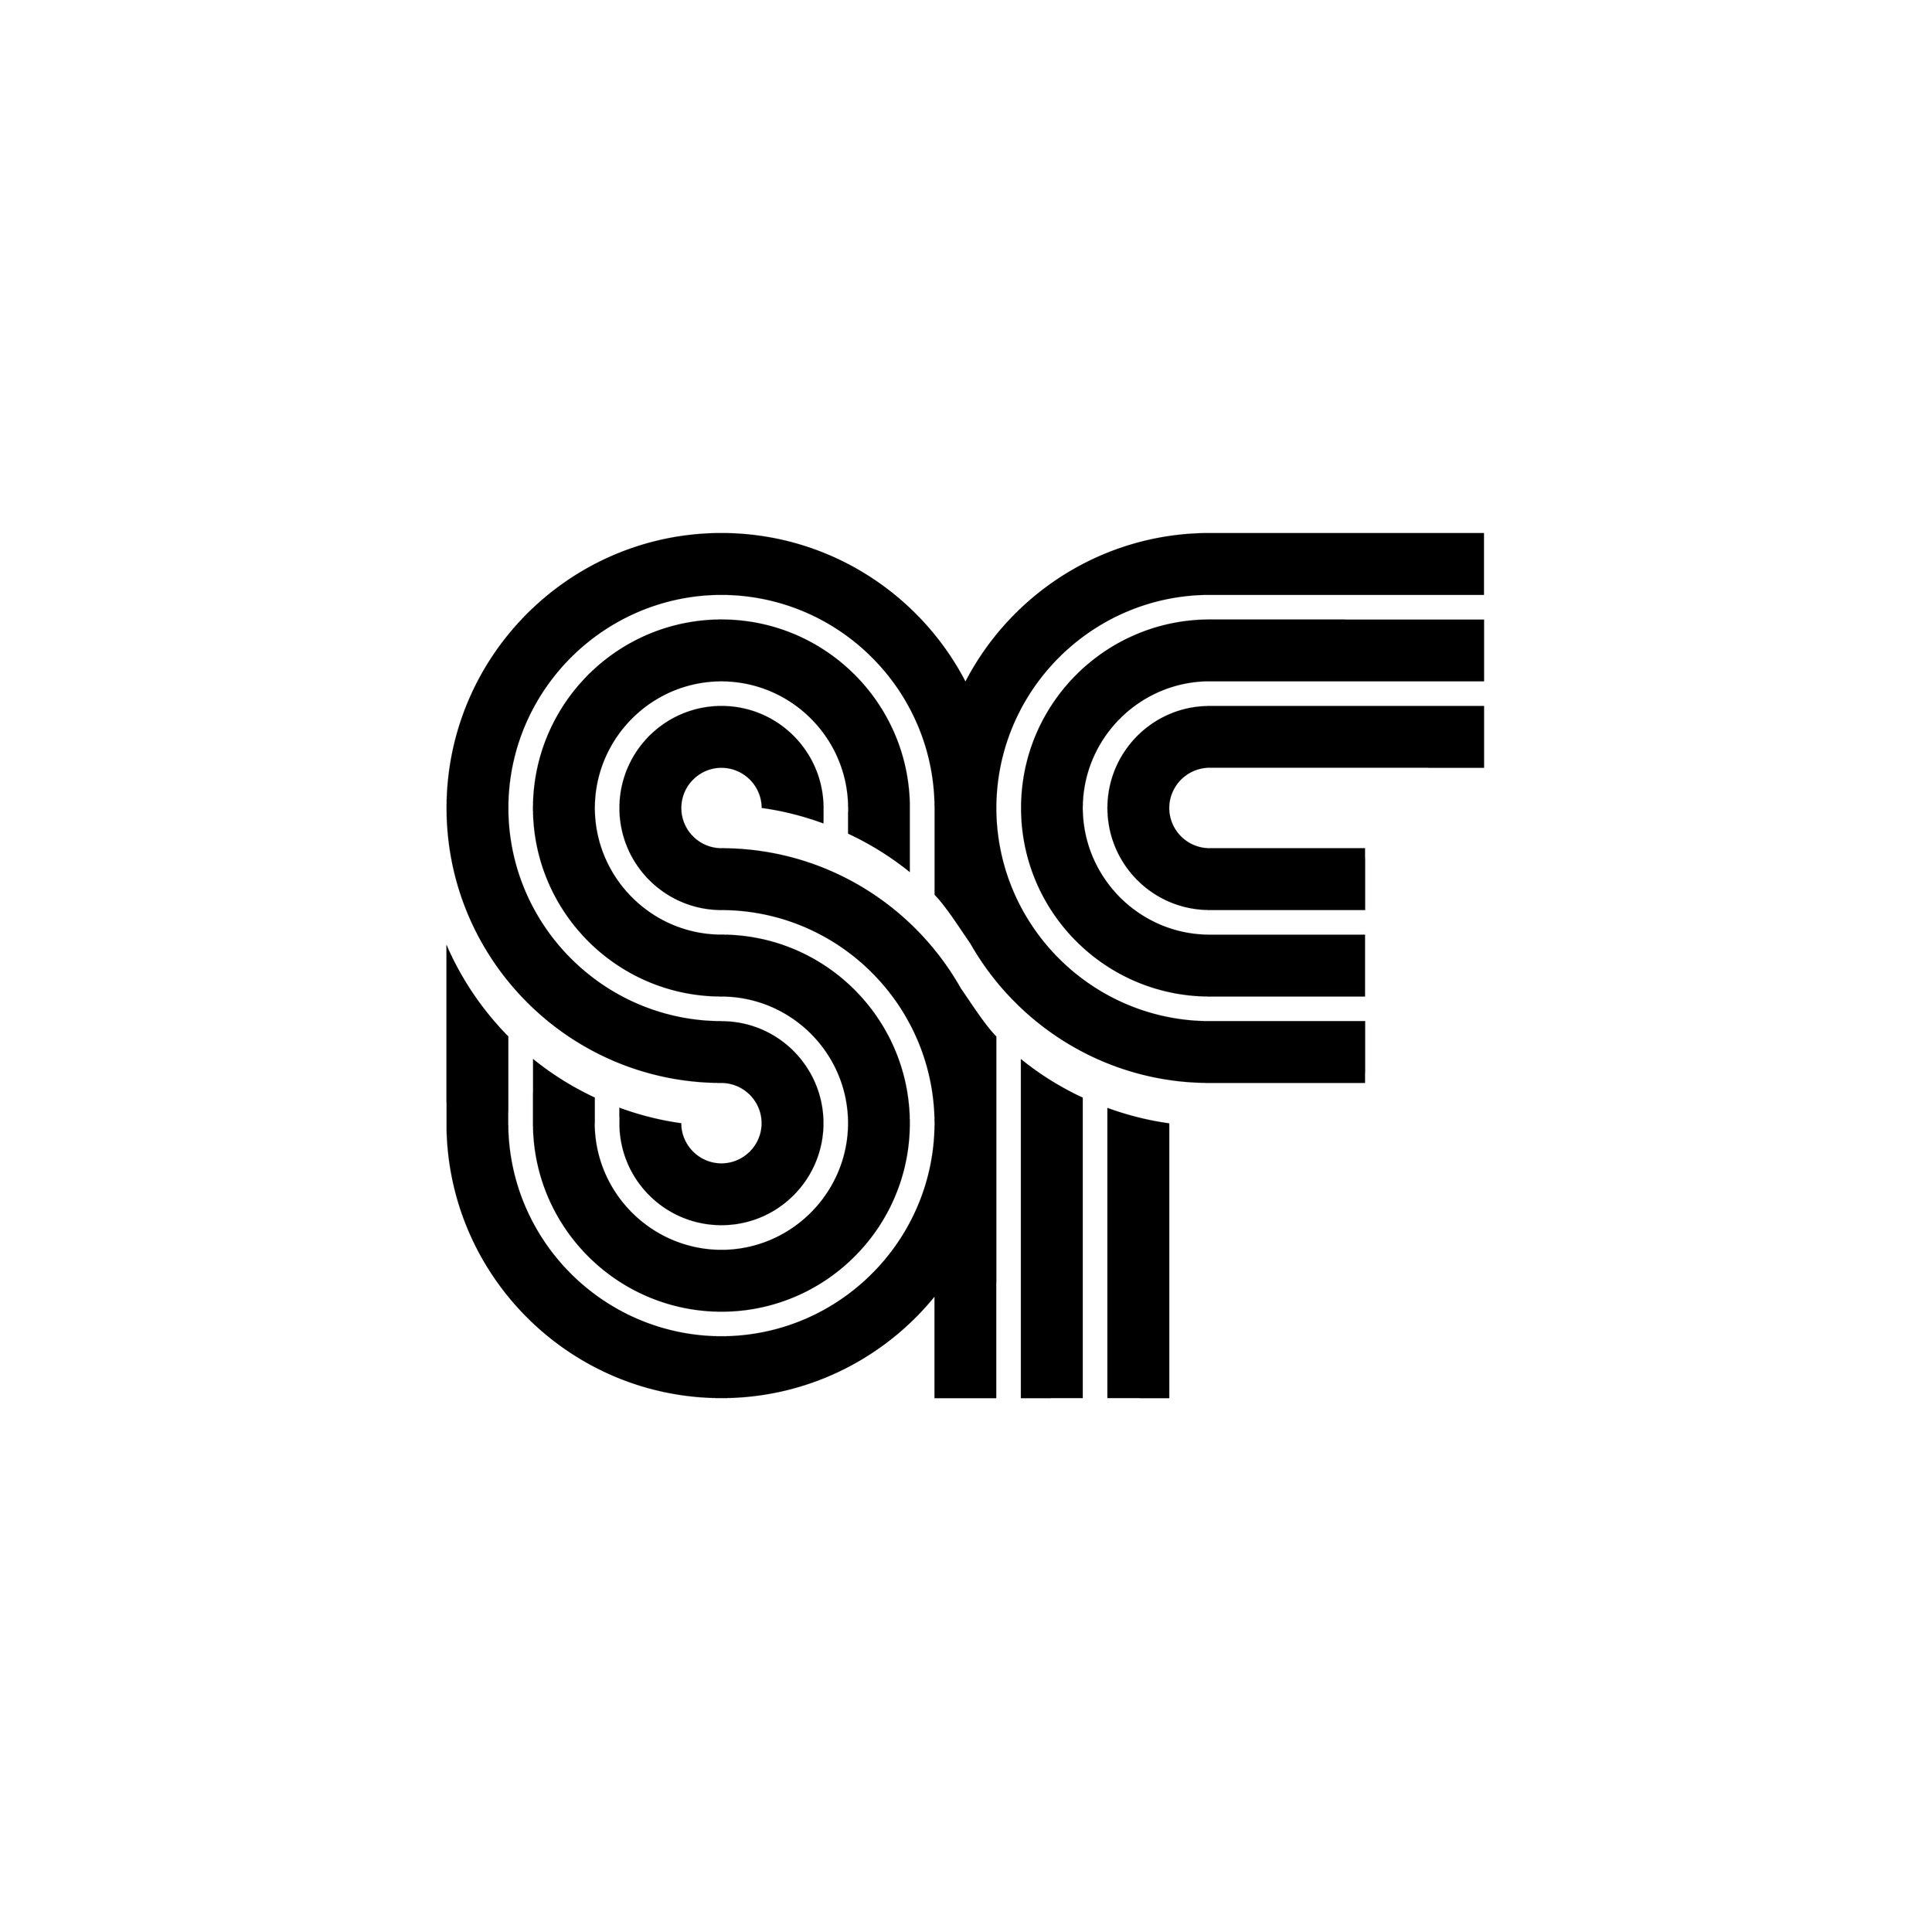 sf logo canada house.jpg